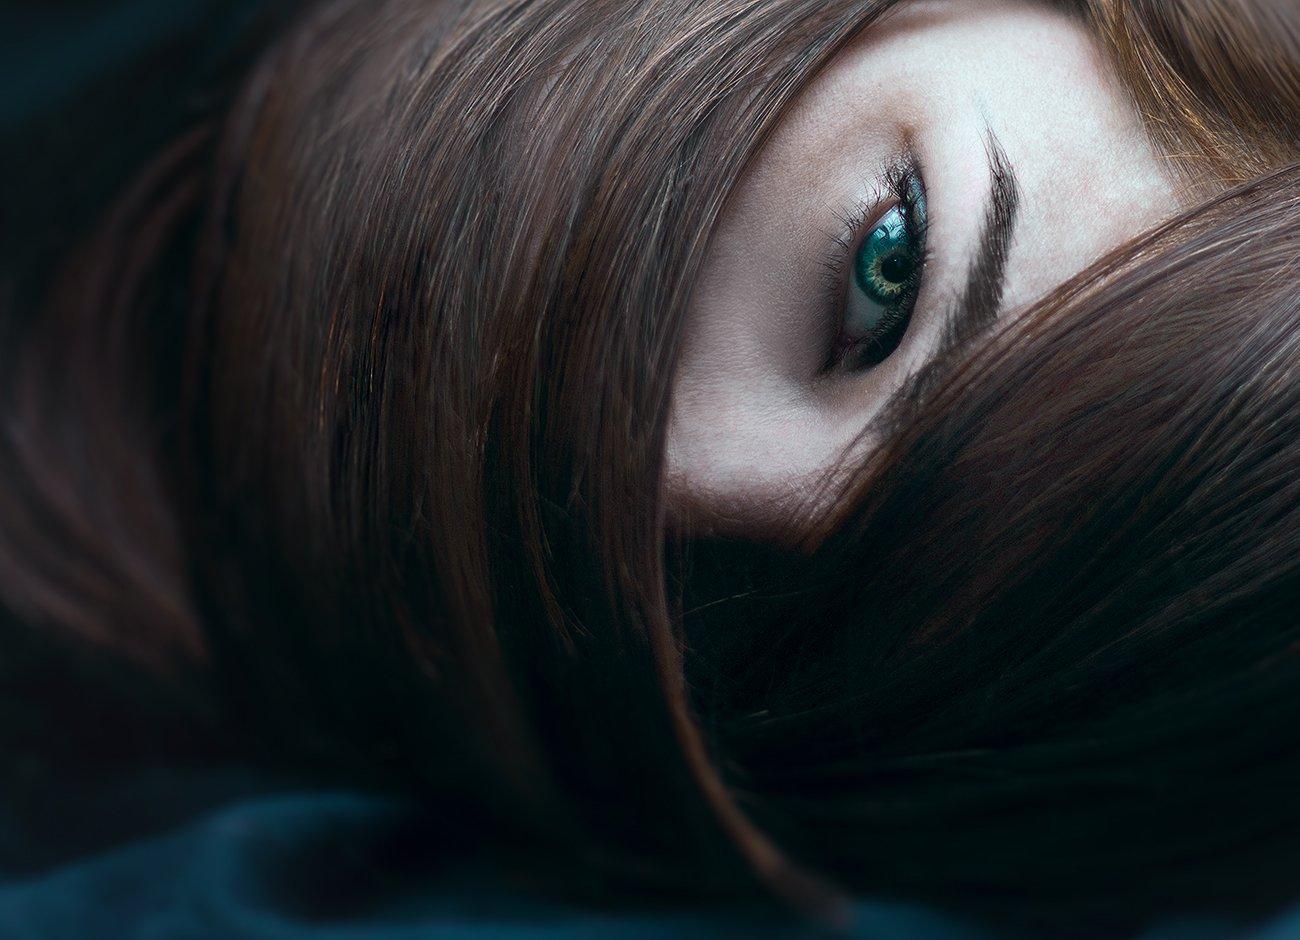 Девушка, взгляд, портрет, Анна Северина